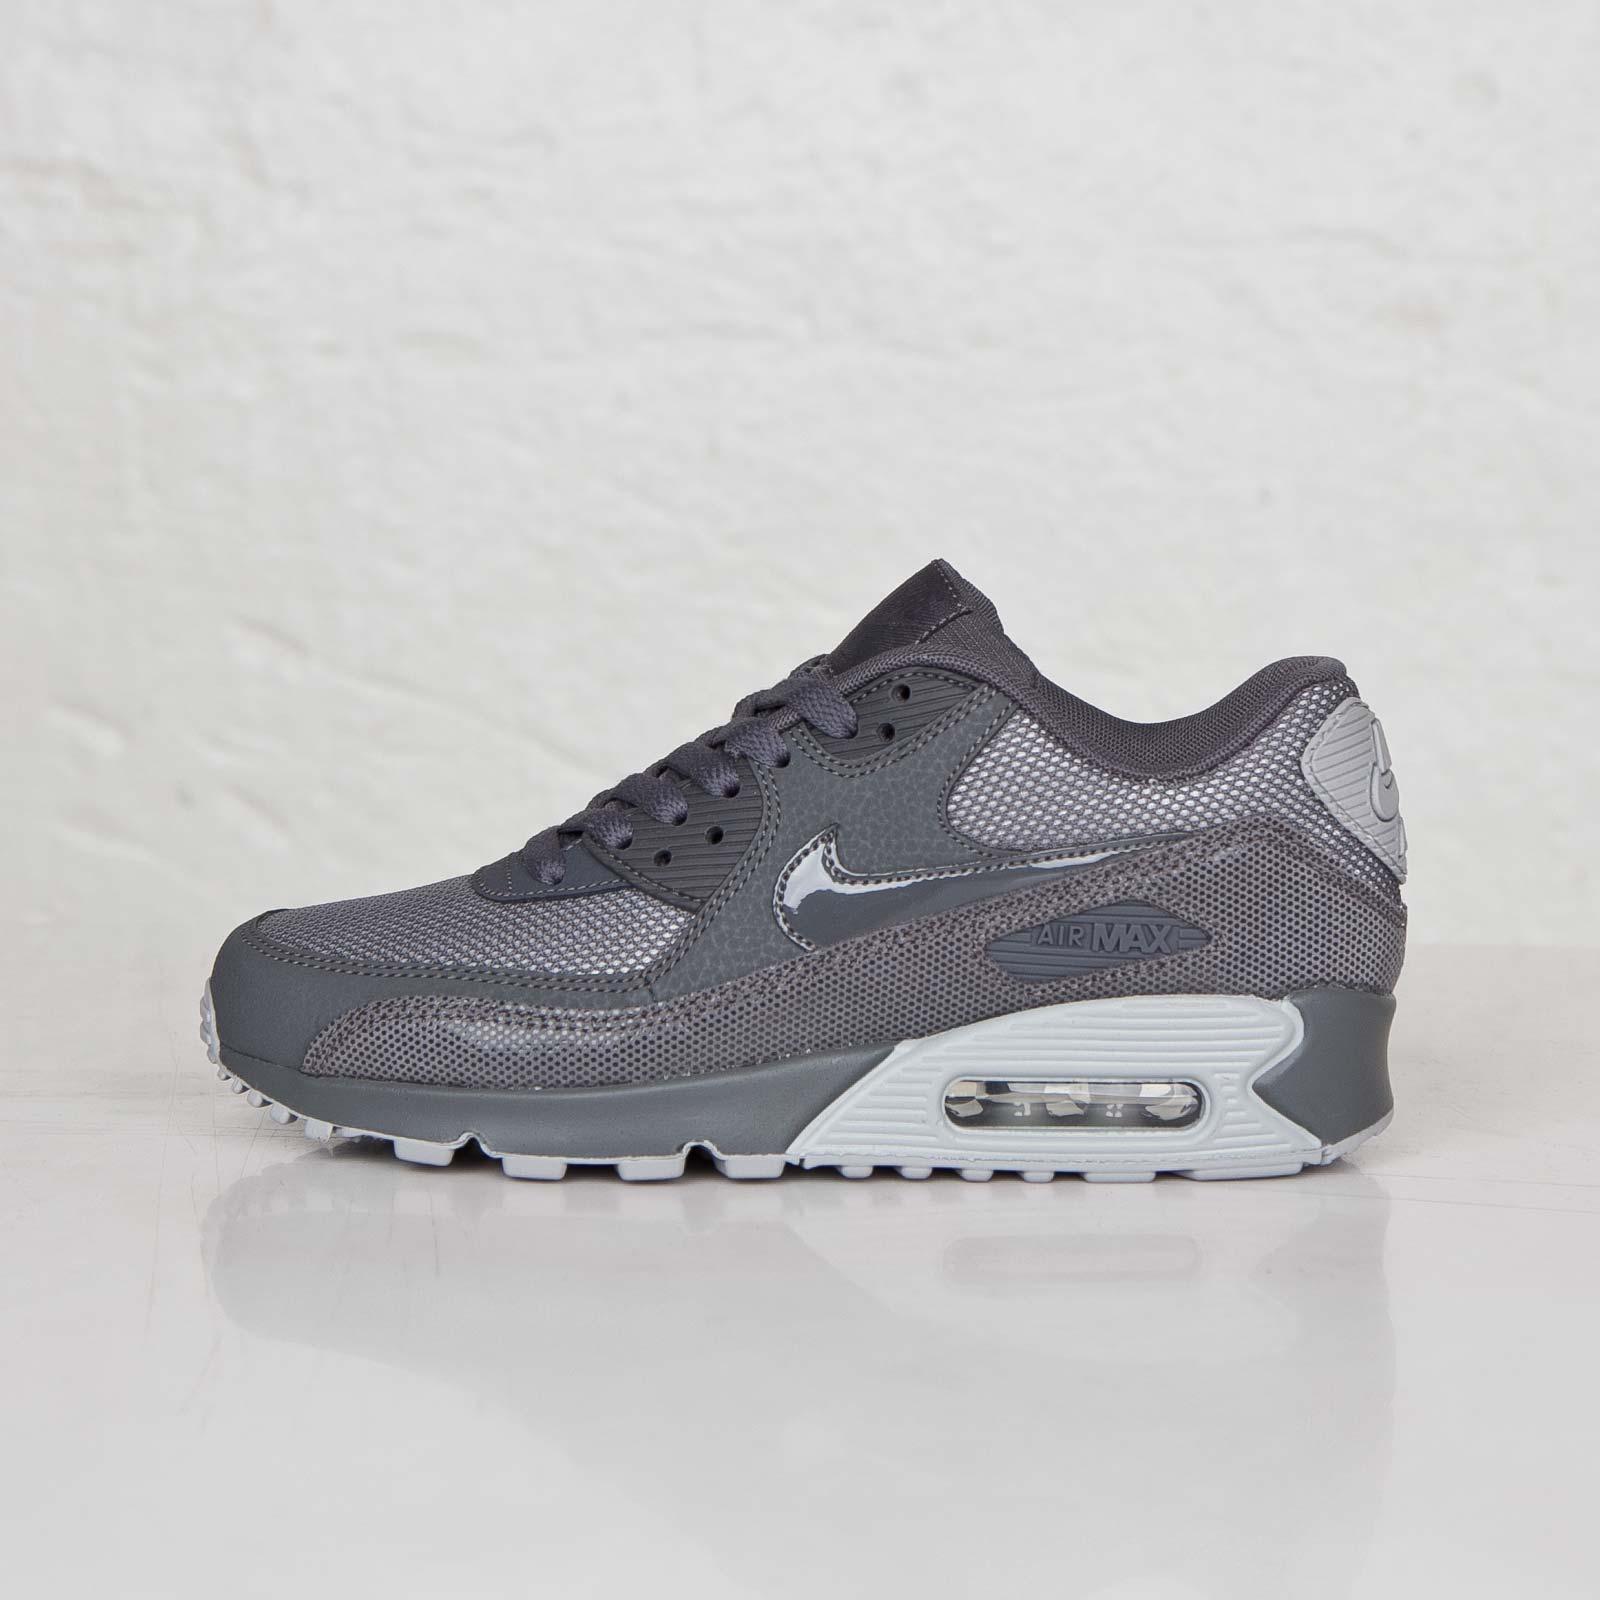 Nike Wmns Air Max 90 Premium - 443817-004 - SNS | sneakers ...